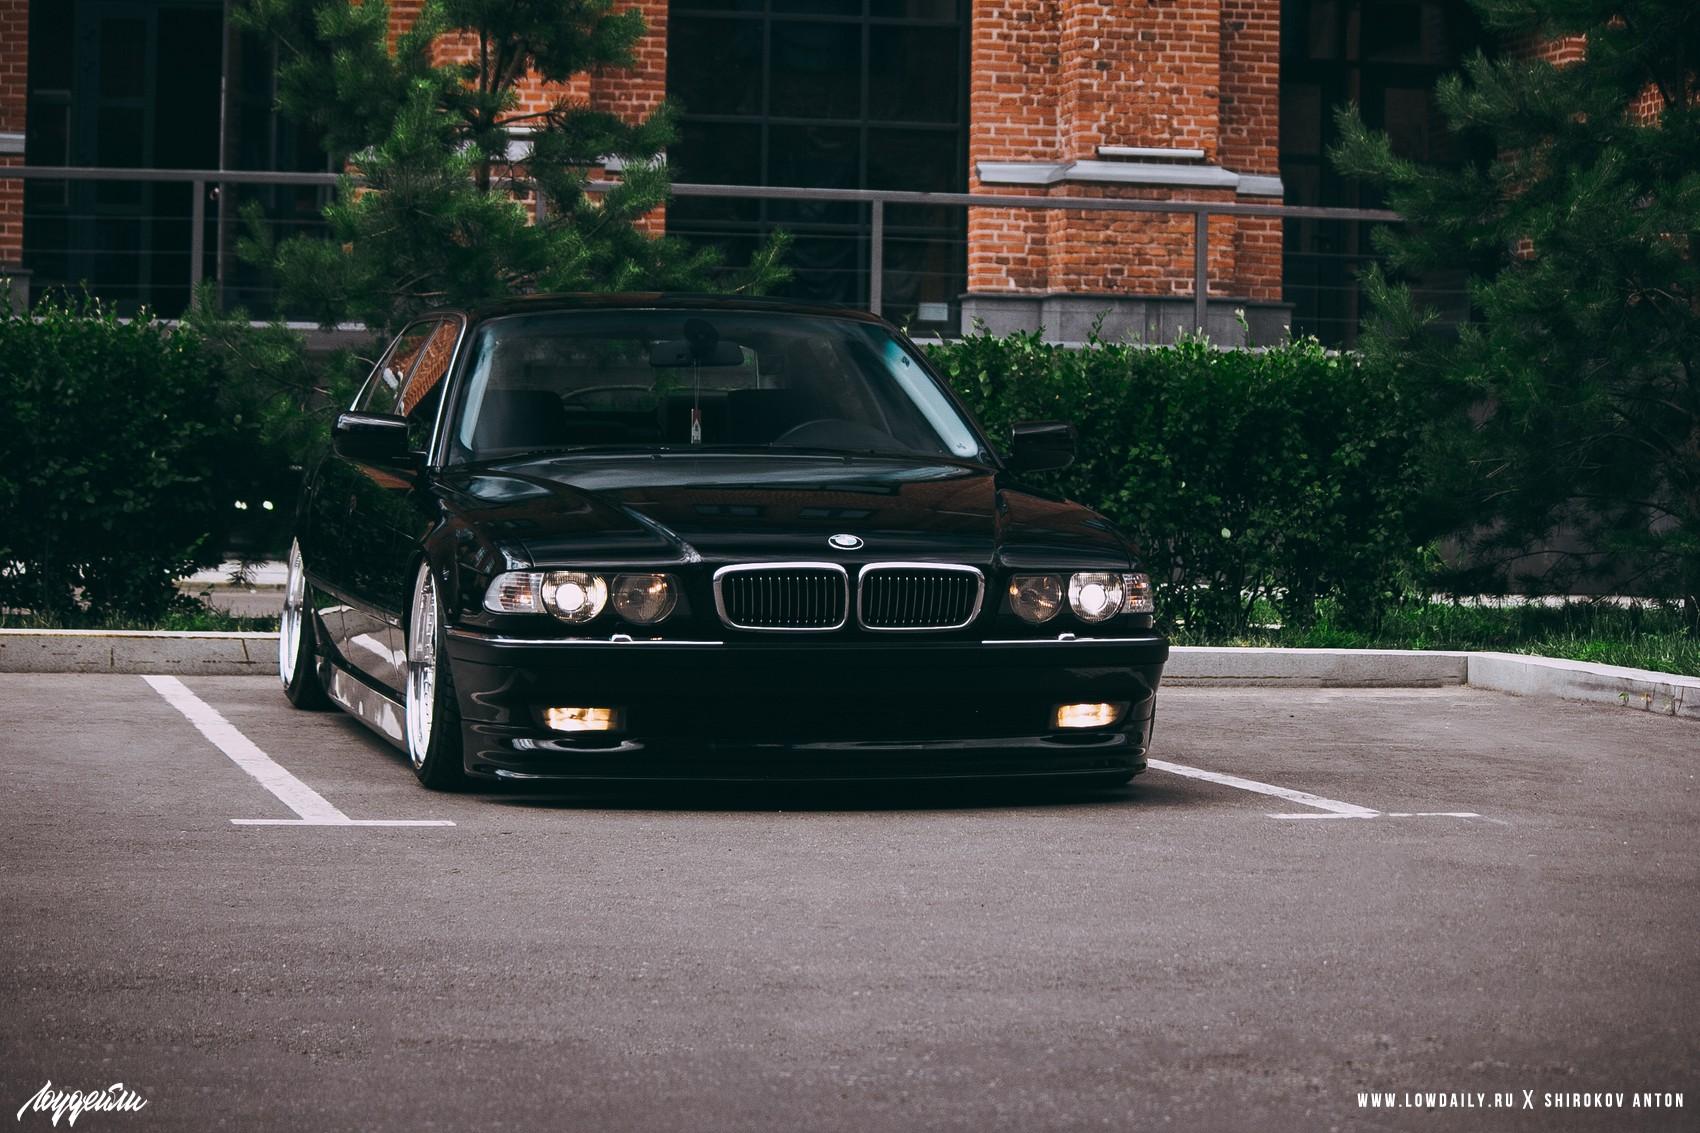 BMW E38 Lowdaily _MG_7022